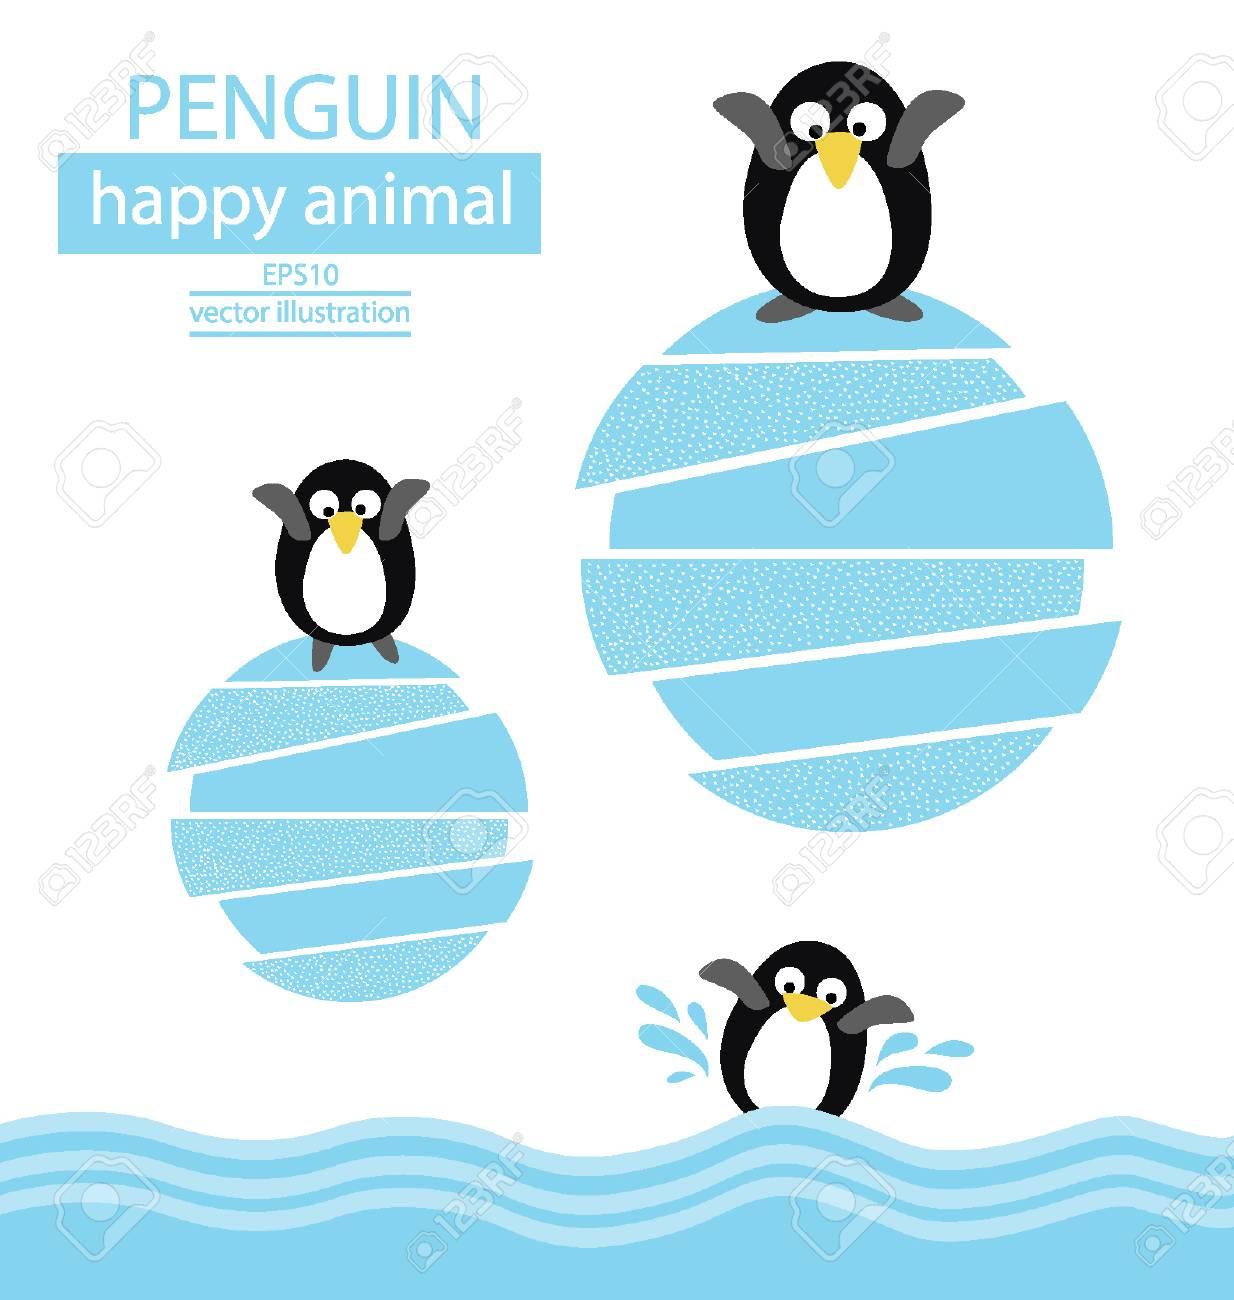 Penguin vector illustration Stock Vector - 25122764